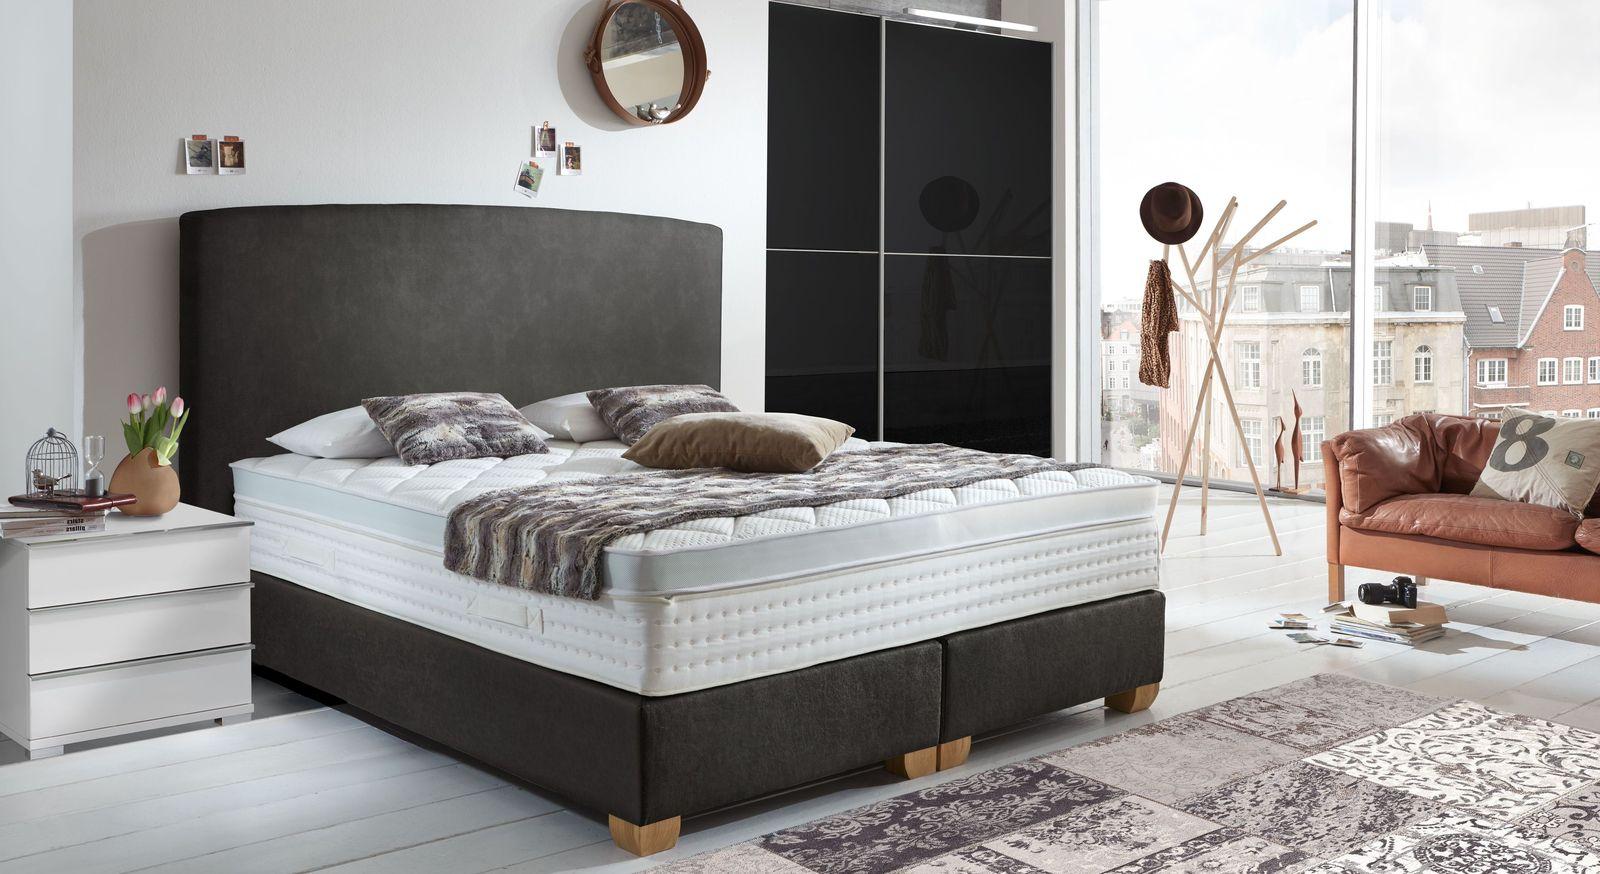 Komplett-Schlafzimmer Nottingham mit hochwertigem Boxspringbett